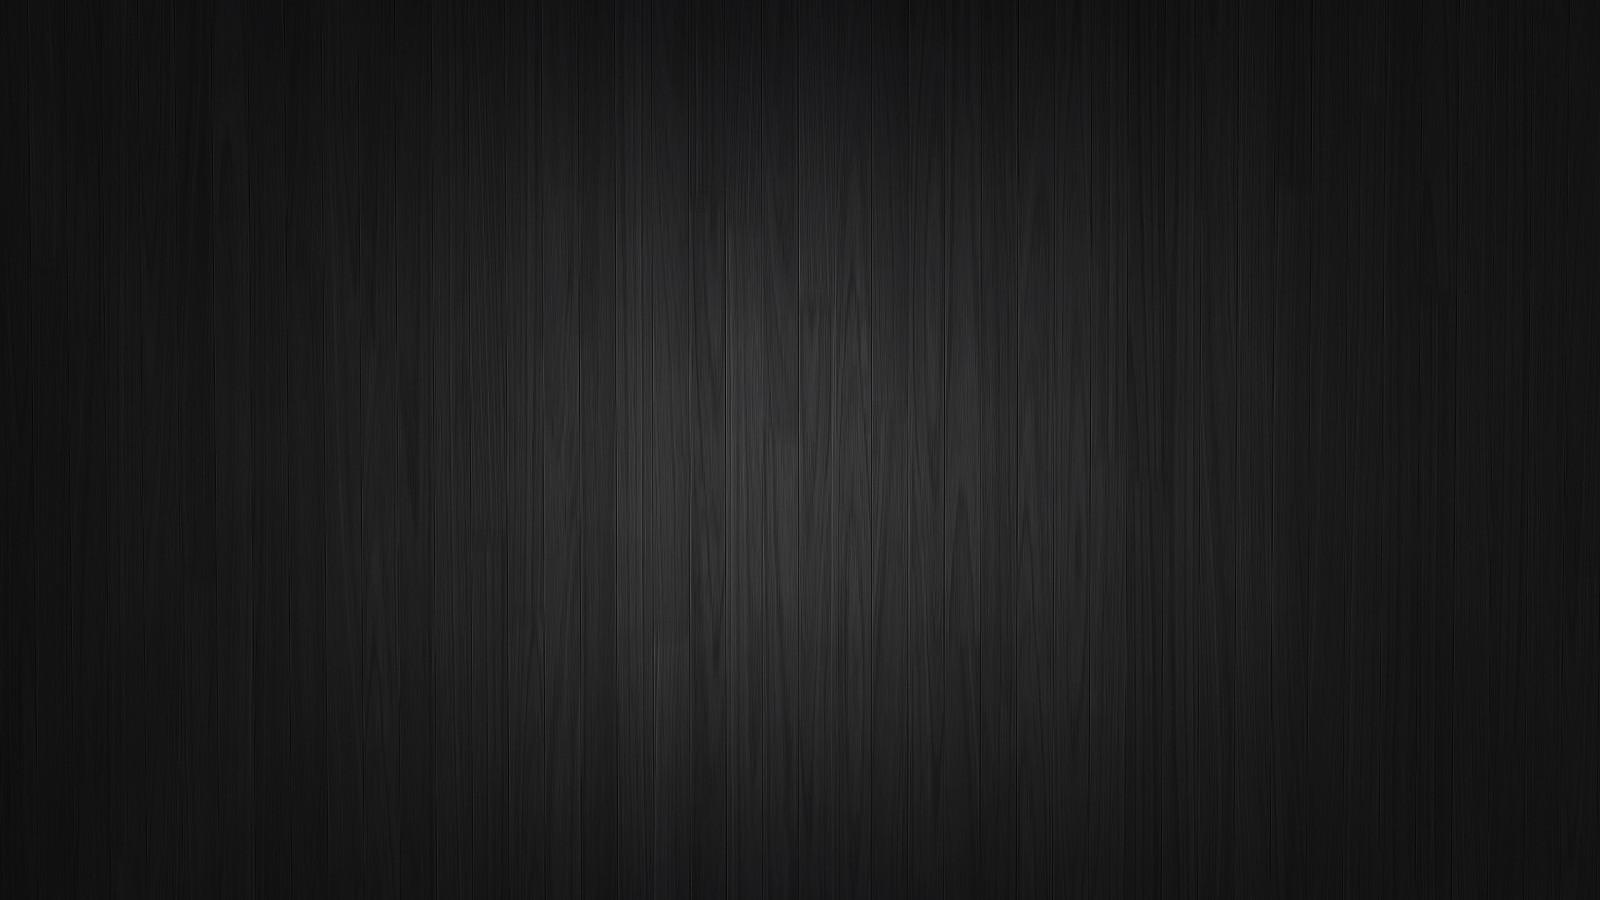 Black Dark Wallpaper 1600x900 Black Dark Wood Textures Wood 1600x900